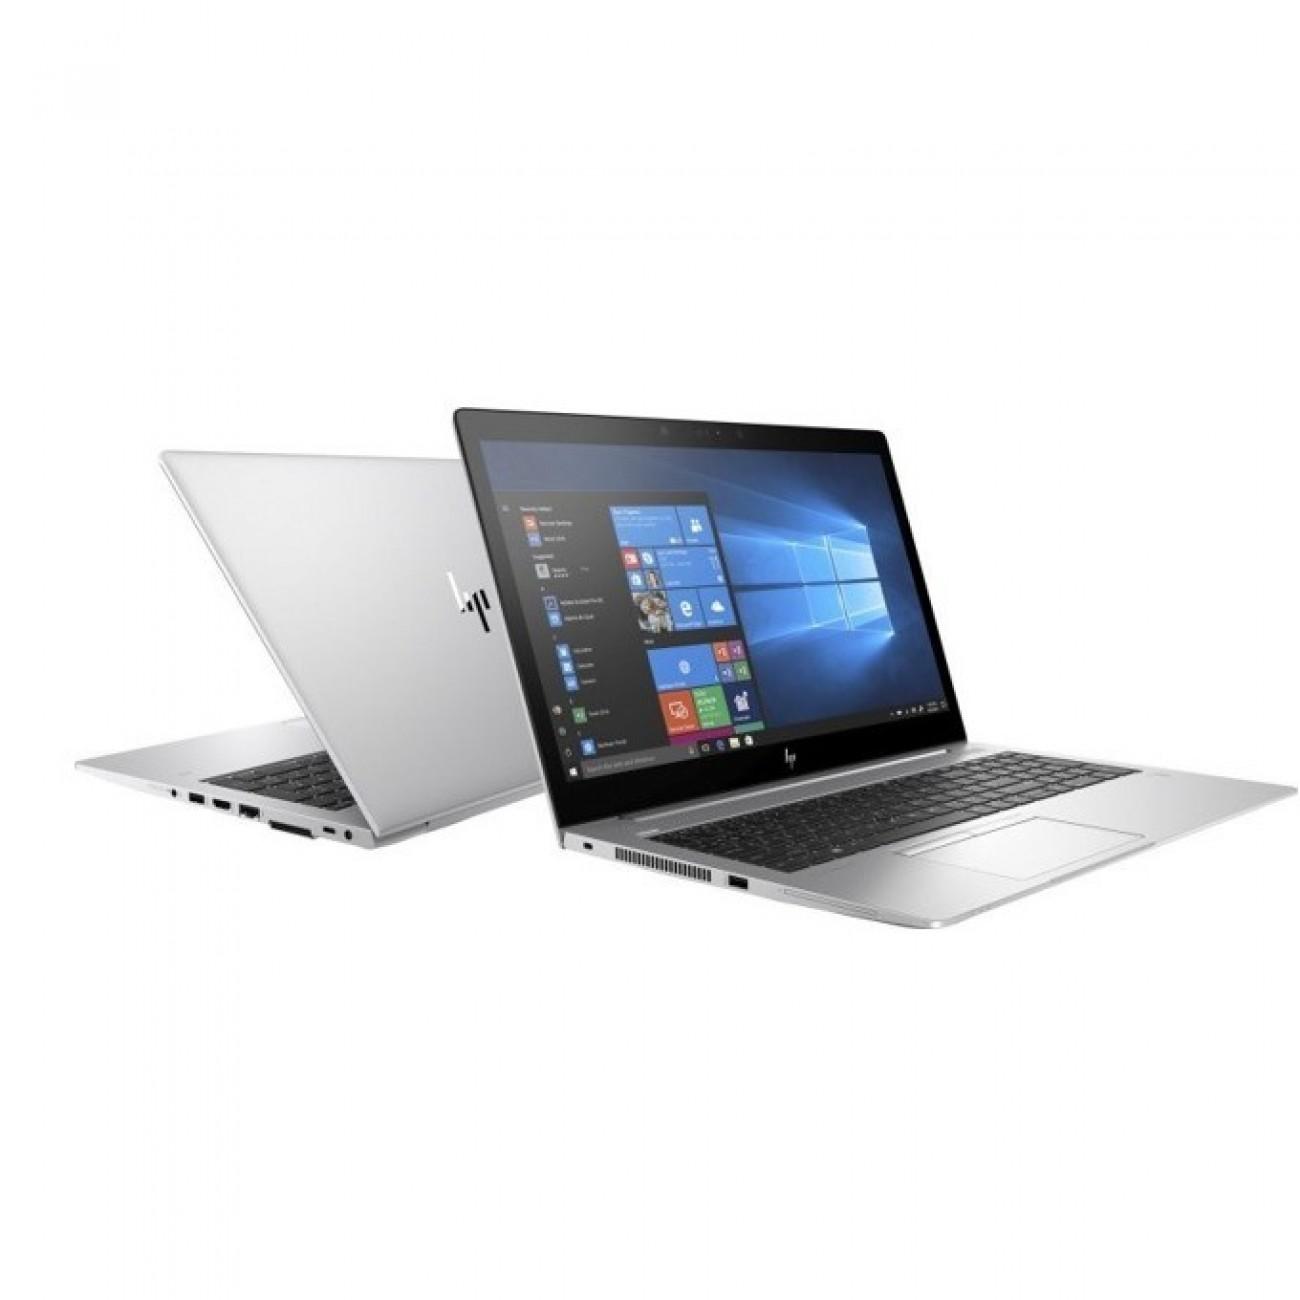 Лаптоп HP EliteBook 850 G5 (3JX19EA)(сребрист), четириядрен Kaby Lake R Intel Core i7-8550U 1.8/4.0 GHz, 15.6 (39.62 cm) Full HD IPS UWVA Anti-Glare Display, (HDMI), 8GB DDR4, 256GB SSD, Thunderbolt, Windows 10, 1.93 kg в Лаптопи -  | Alleop